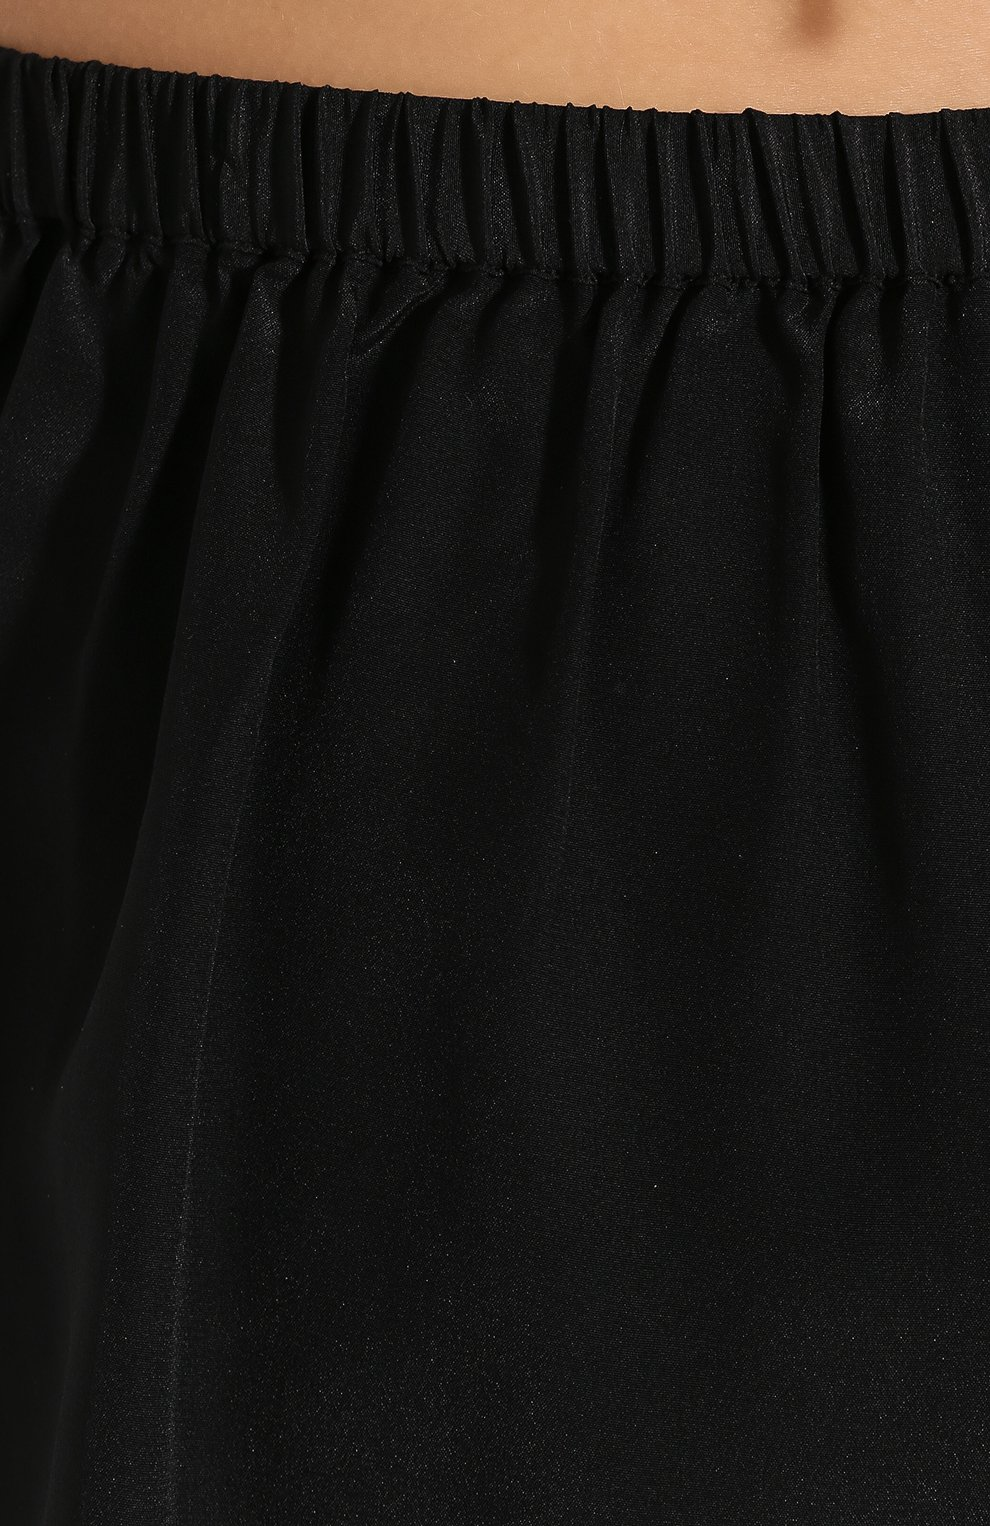 Женские шорты CHANTAL THOMASS черного цвета, арт. TA17_чер | Фото 5